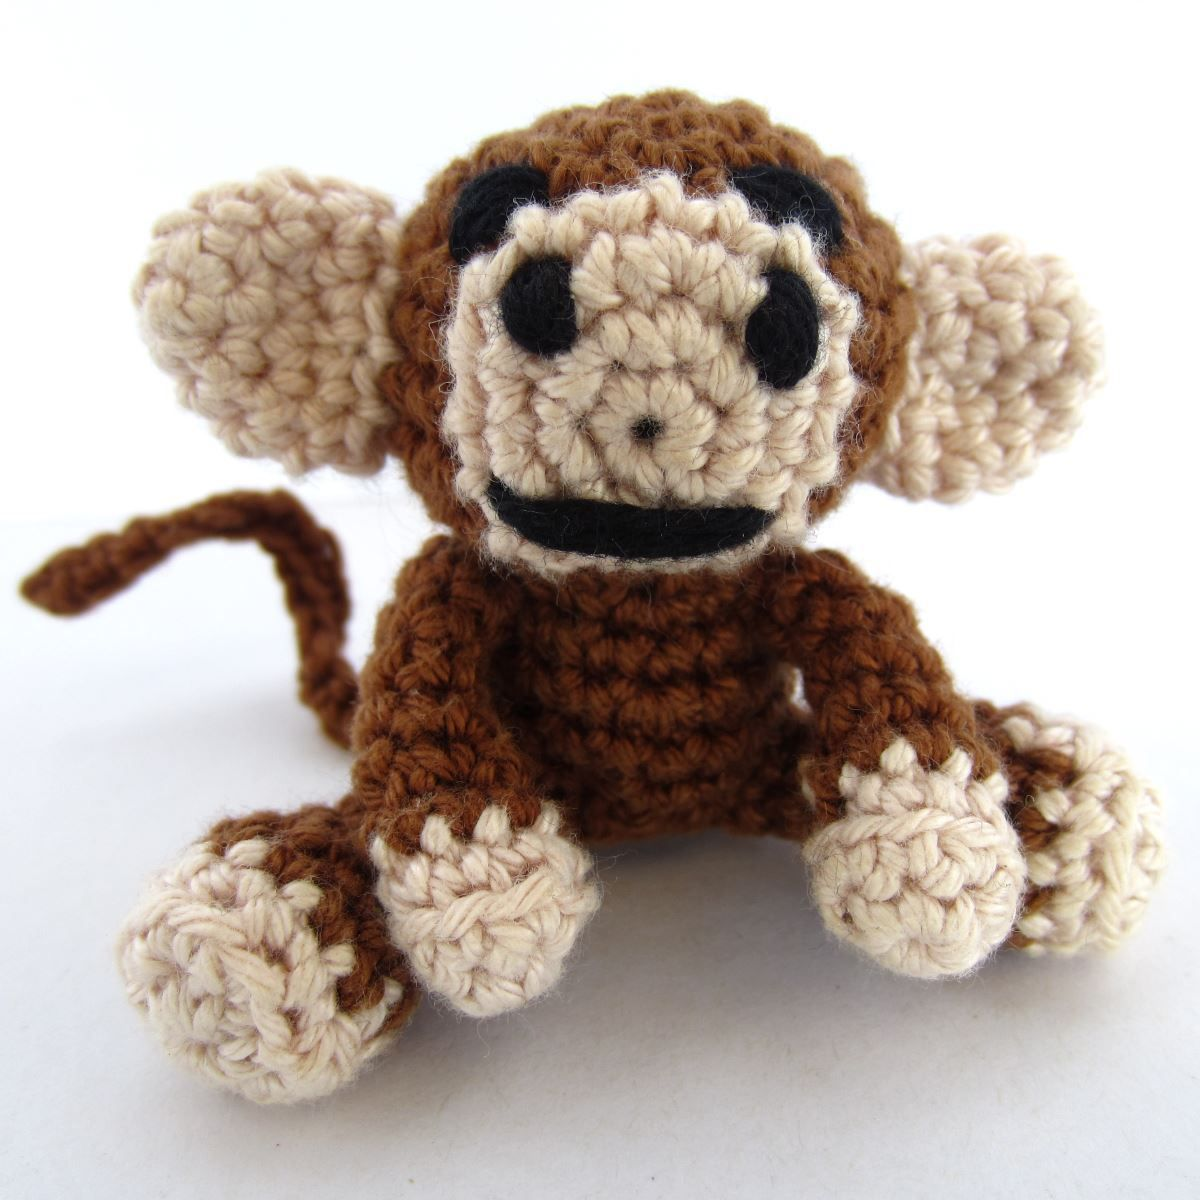 Amigurumi Affe Häkeln Beitragsbild Crochet Kids Häkeln Affe